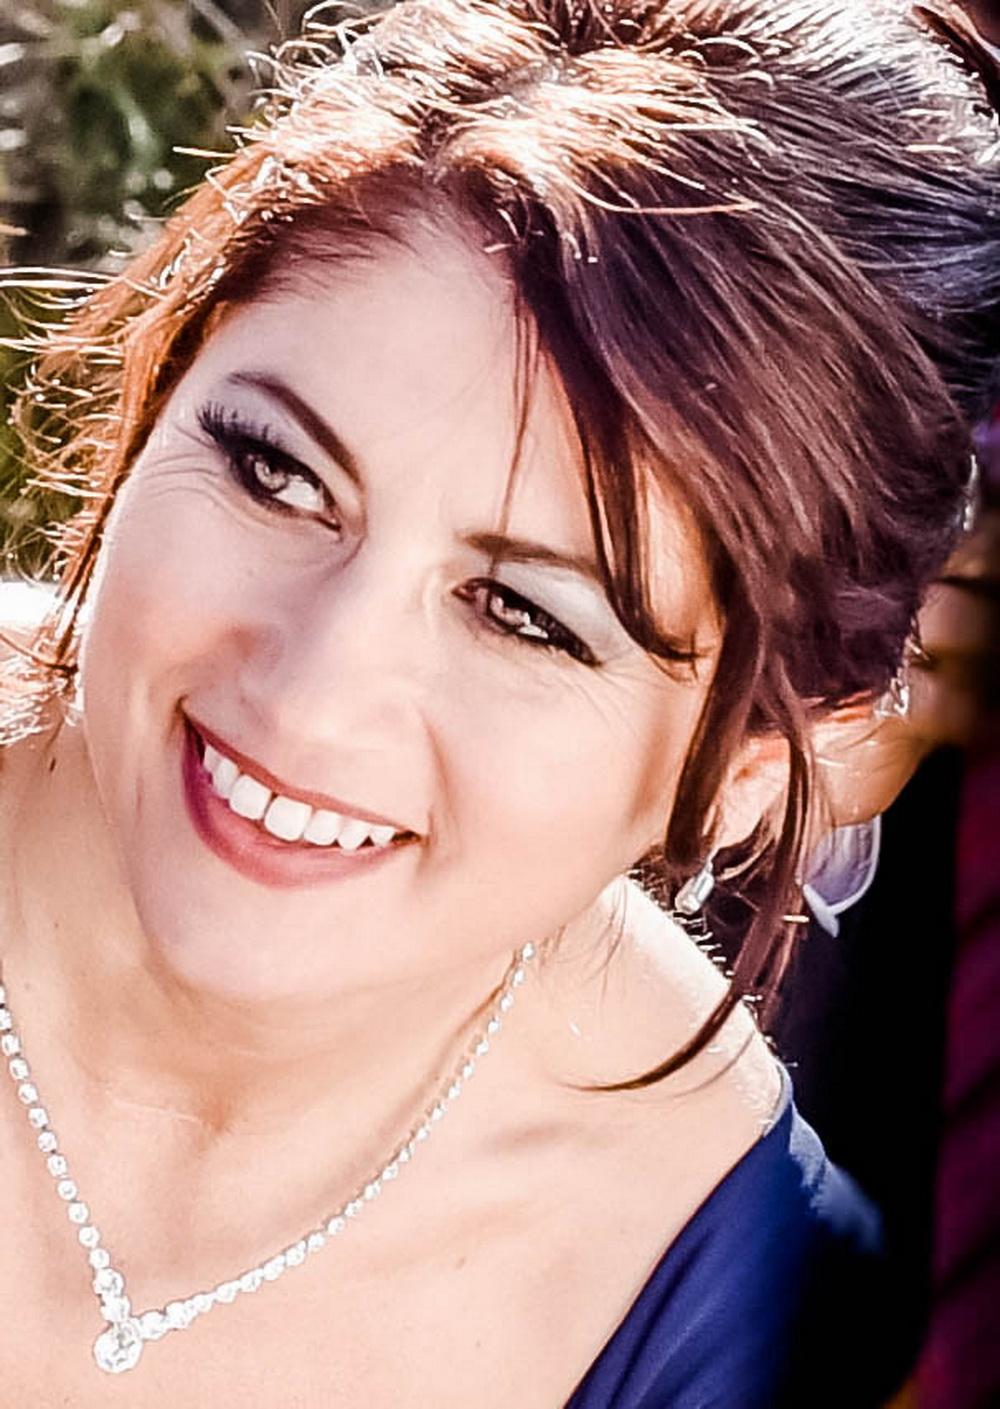 Claudia Sittig Photography - Lächeln des Jahres 2015 - 34